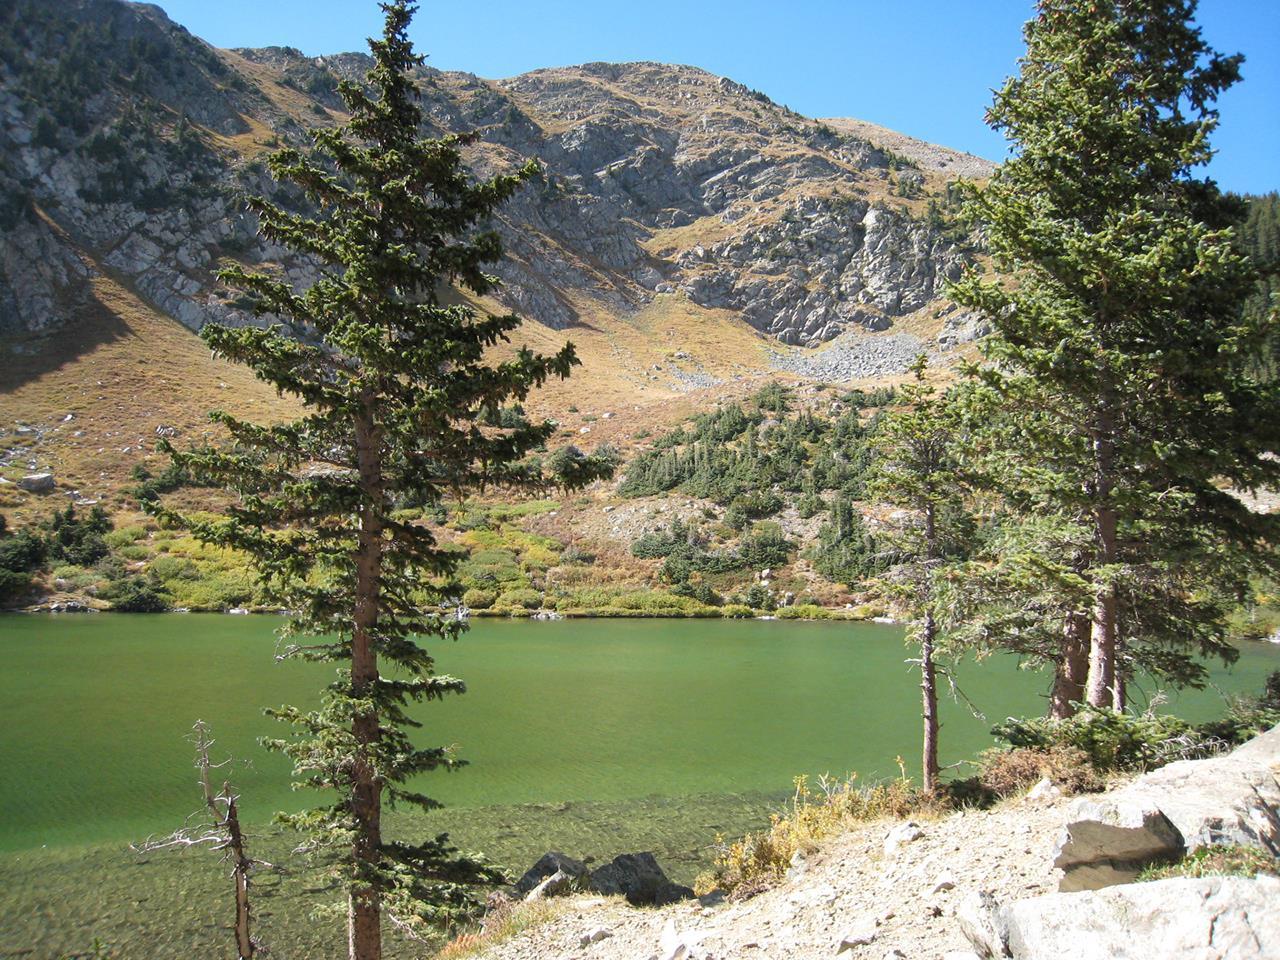 #Taos recreation #Goose Lake #hiking #fishing #Taos #New Mexico